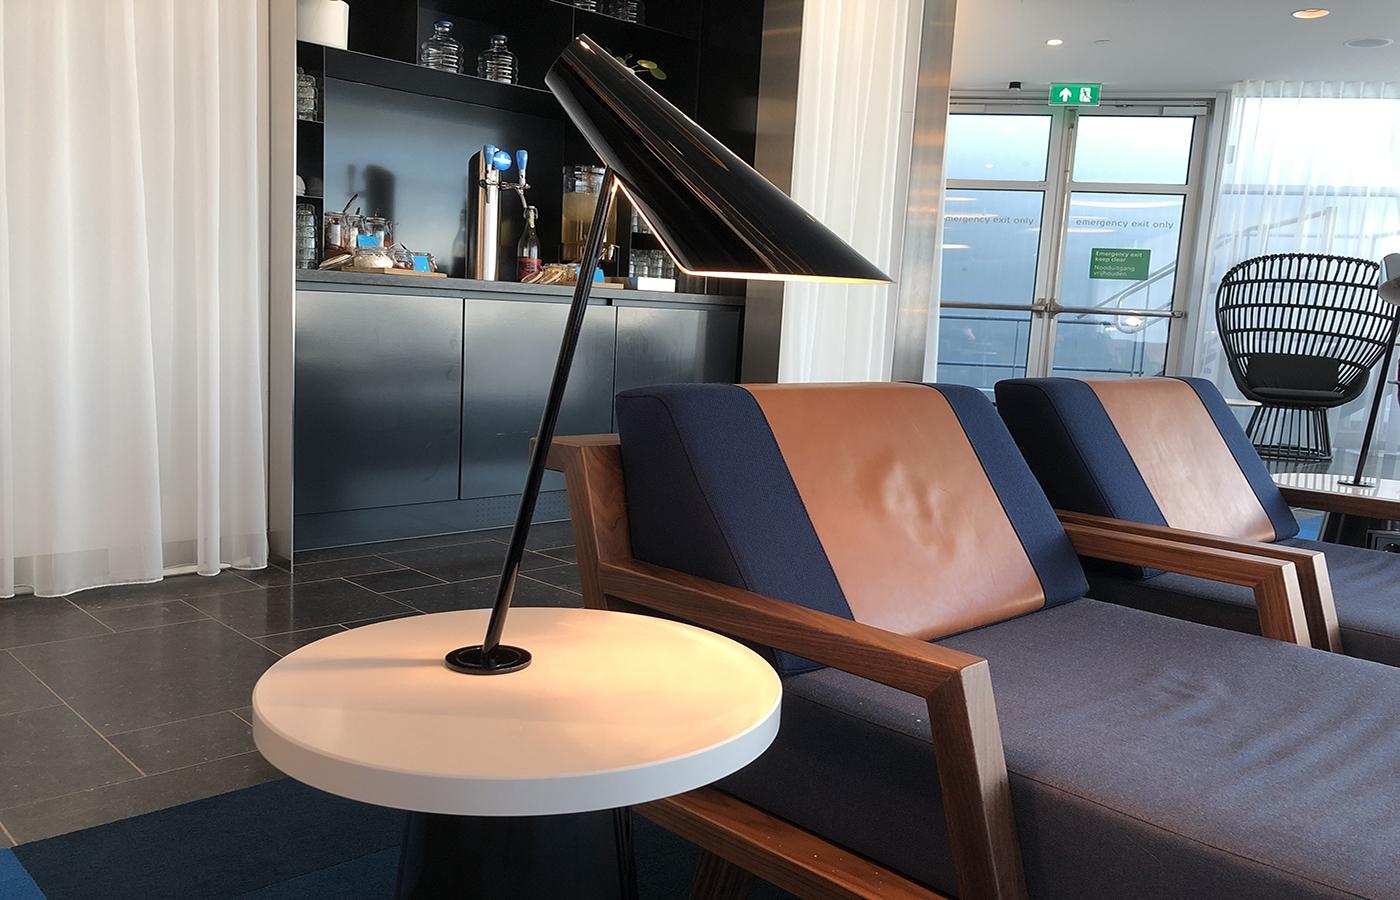 KLM Crown Lounge Heineken bar